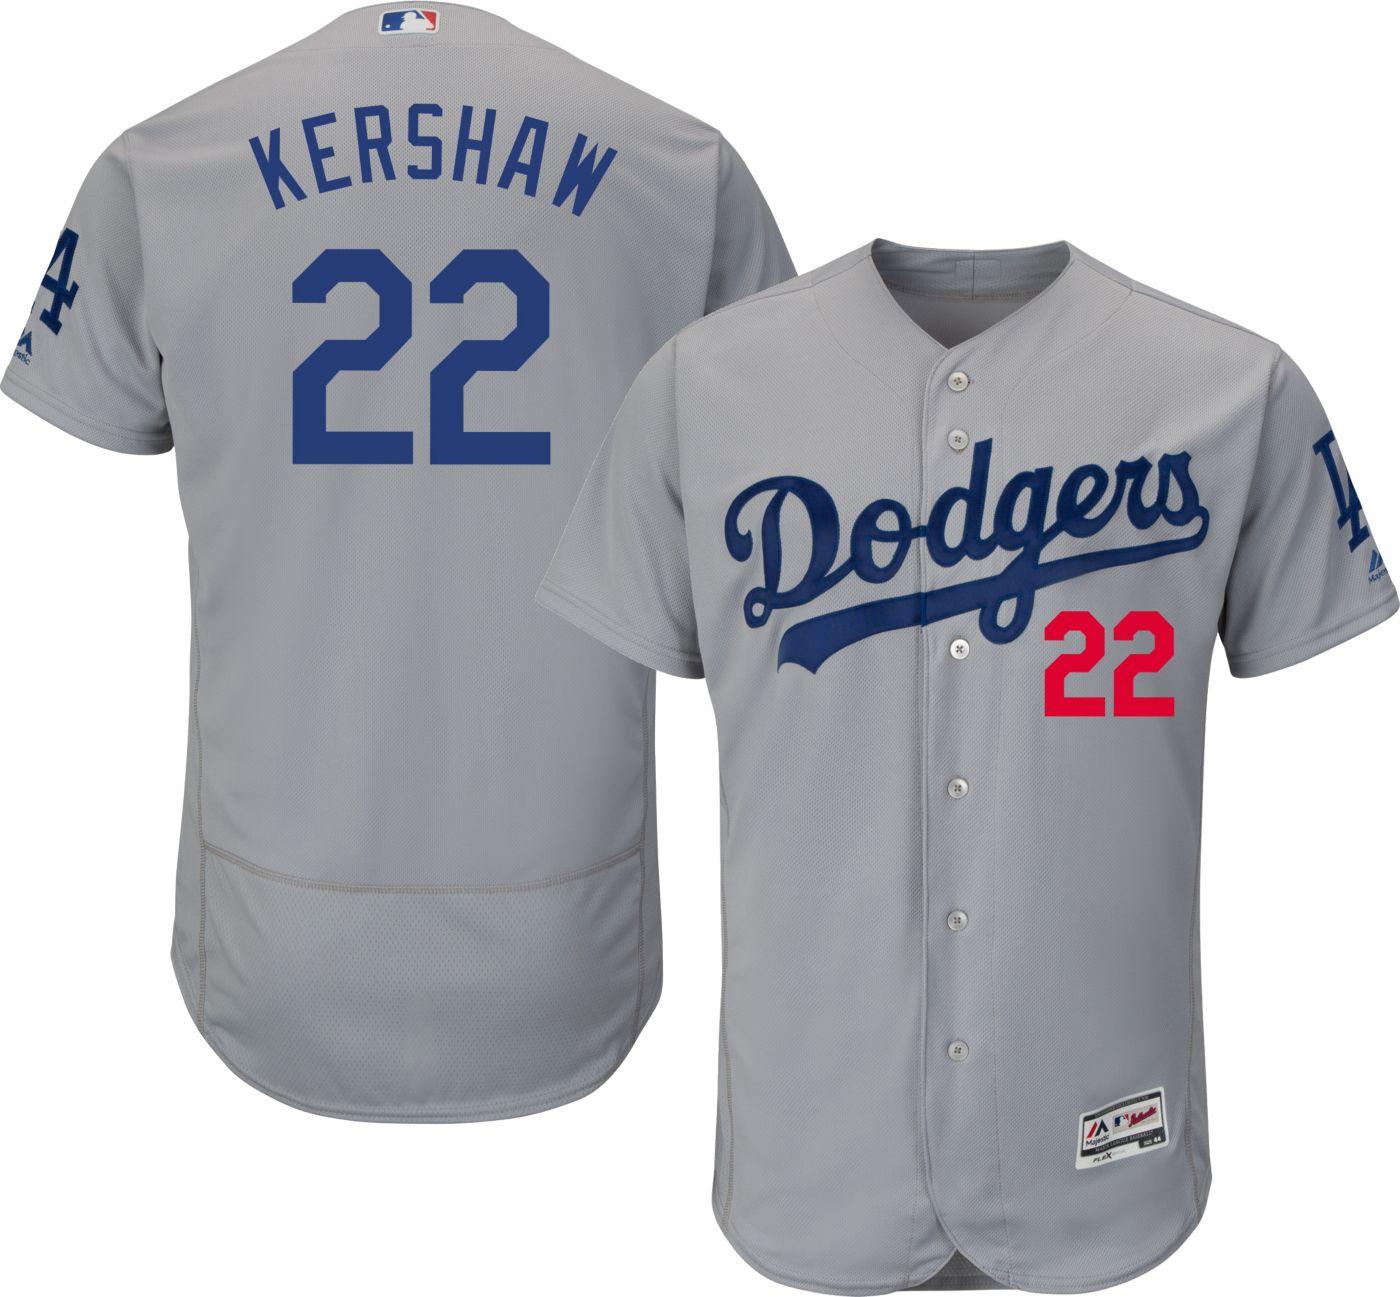 Majestic Men's Authentic Los Angeles Dodgers Clayton Kershaw #22 Alternate Road Grey Flex Base On-Field Jersey